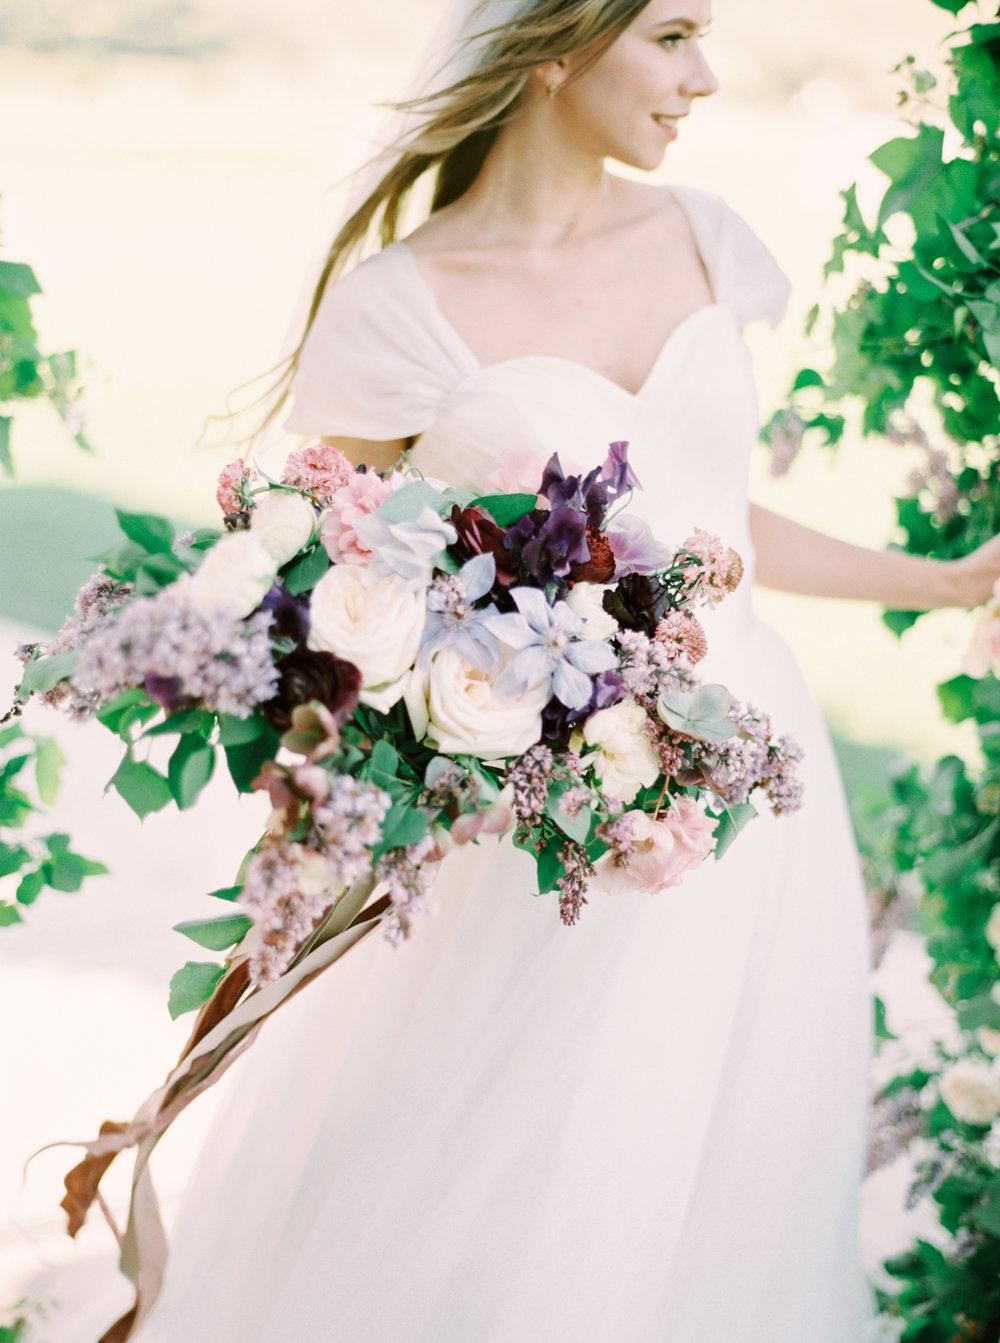 This-Love-of-Yours-Kirigin-Cellars-Flower-Arch-Styled-Shoot-109.jpg